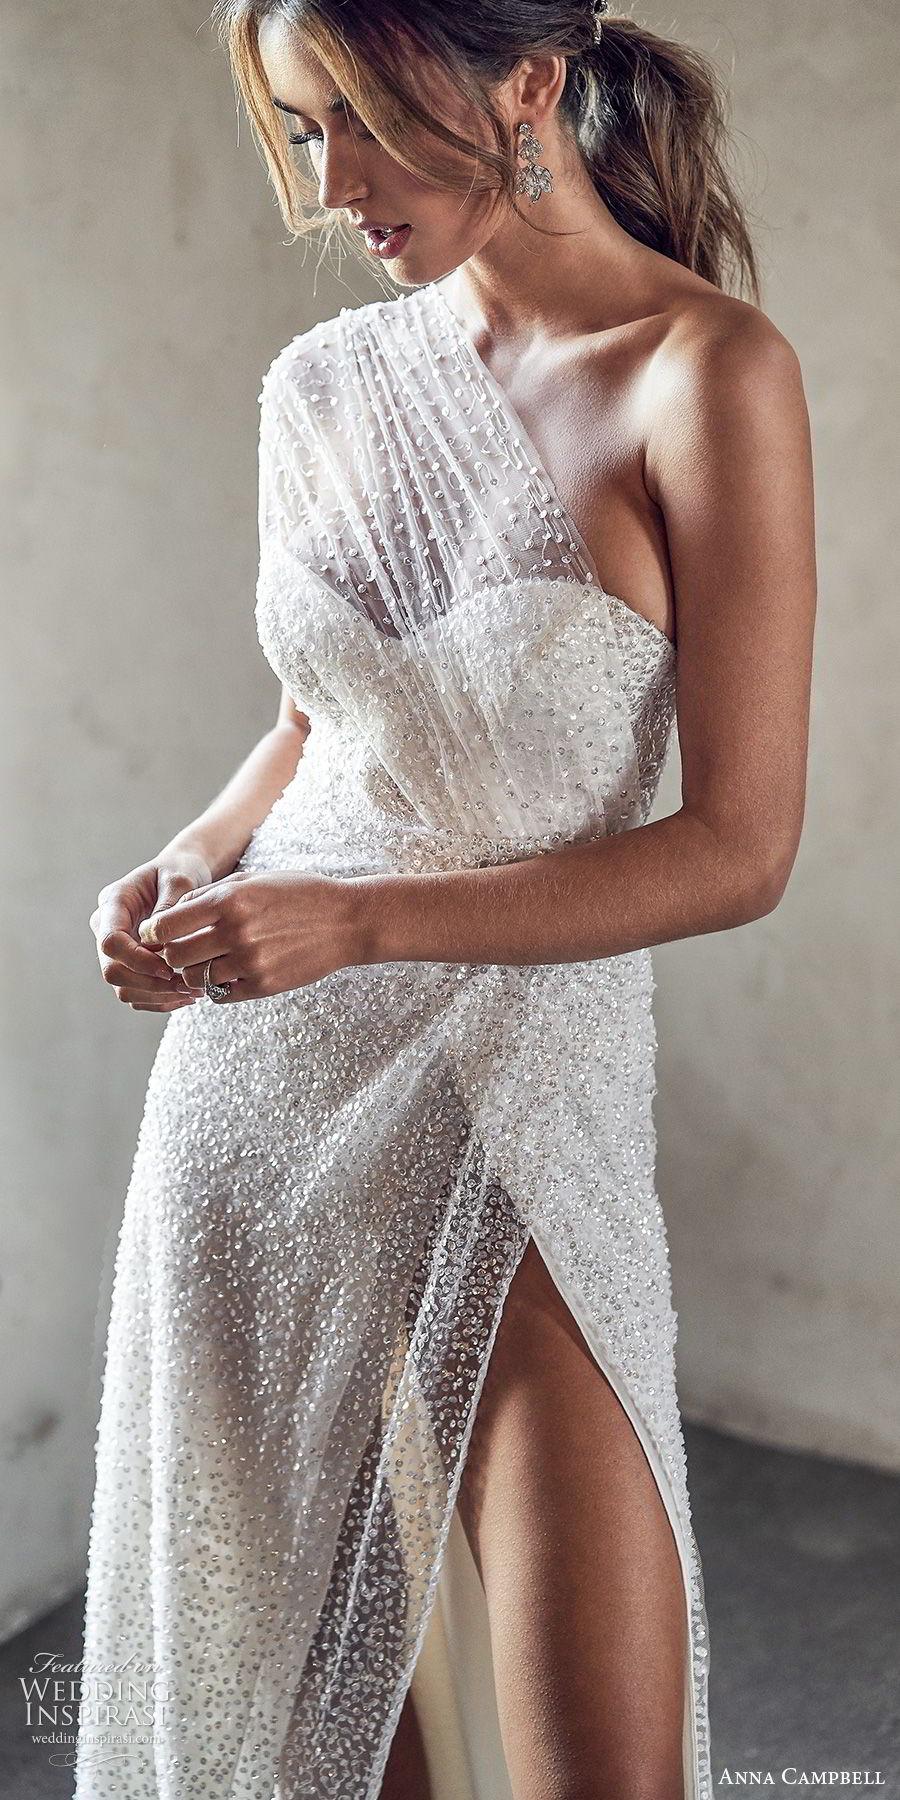 anna campbell 2020 bridal illusion one shoulder ruched bodice sweetheart fully embellished sheath wedding dress (13) slit skirt glitzy glam sexy chapel train zv